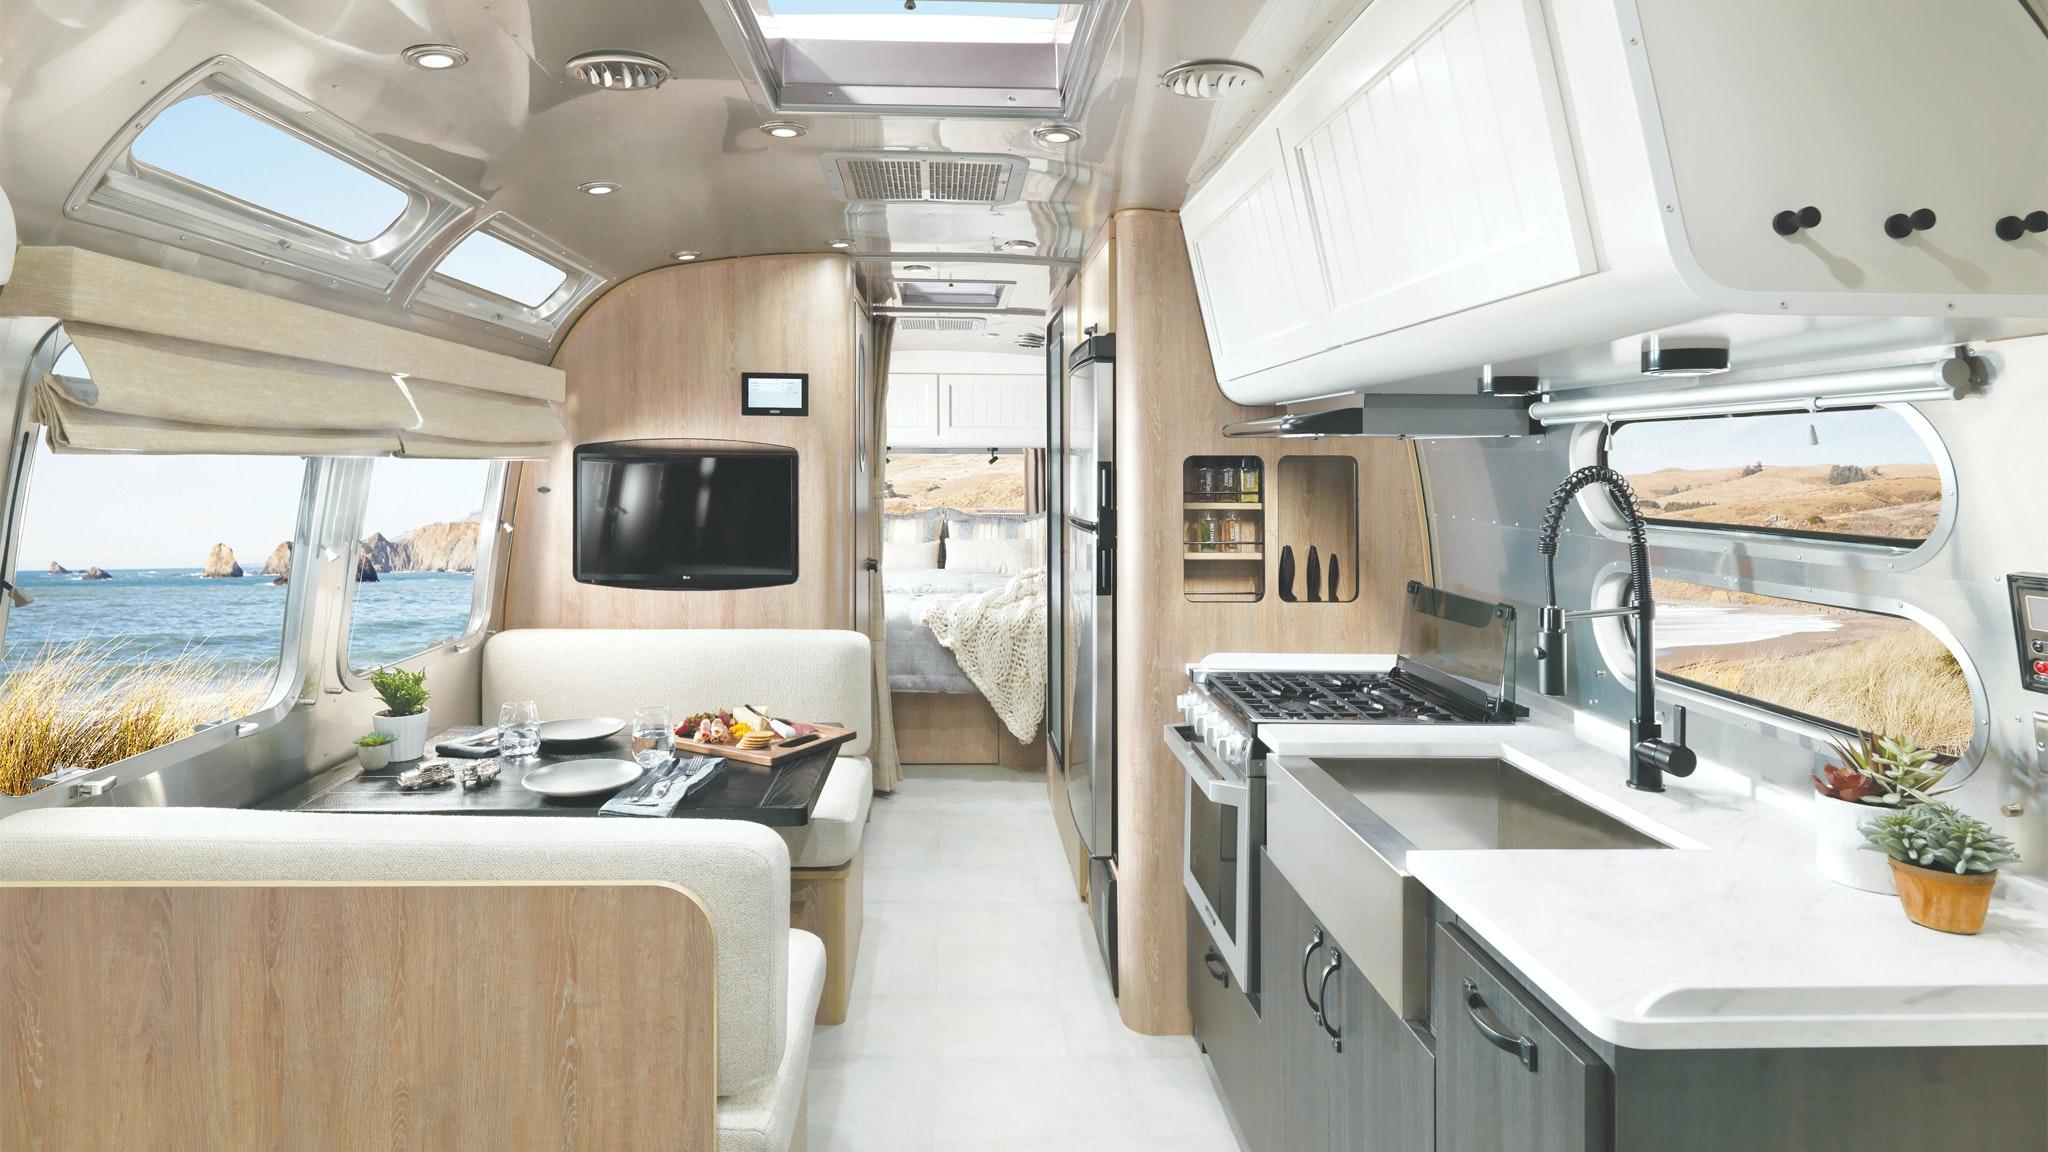 Airstream-X-Pottery-Barn-Interior